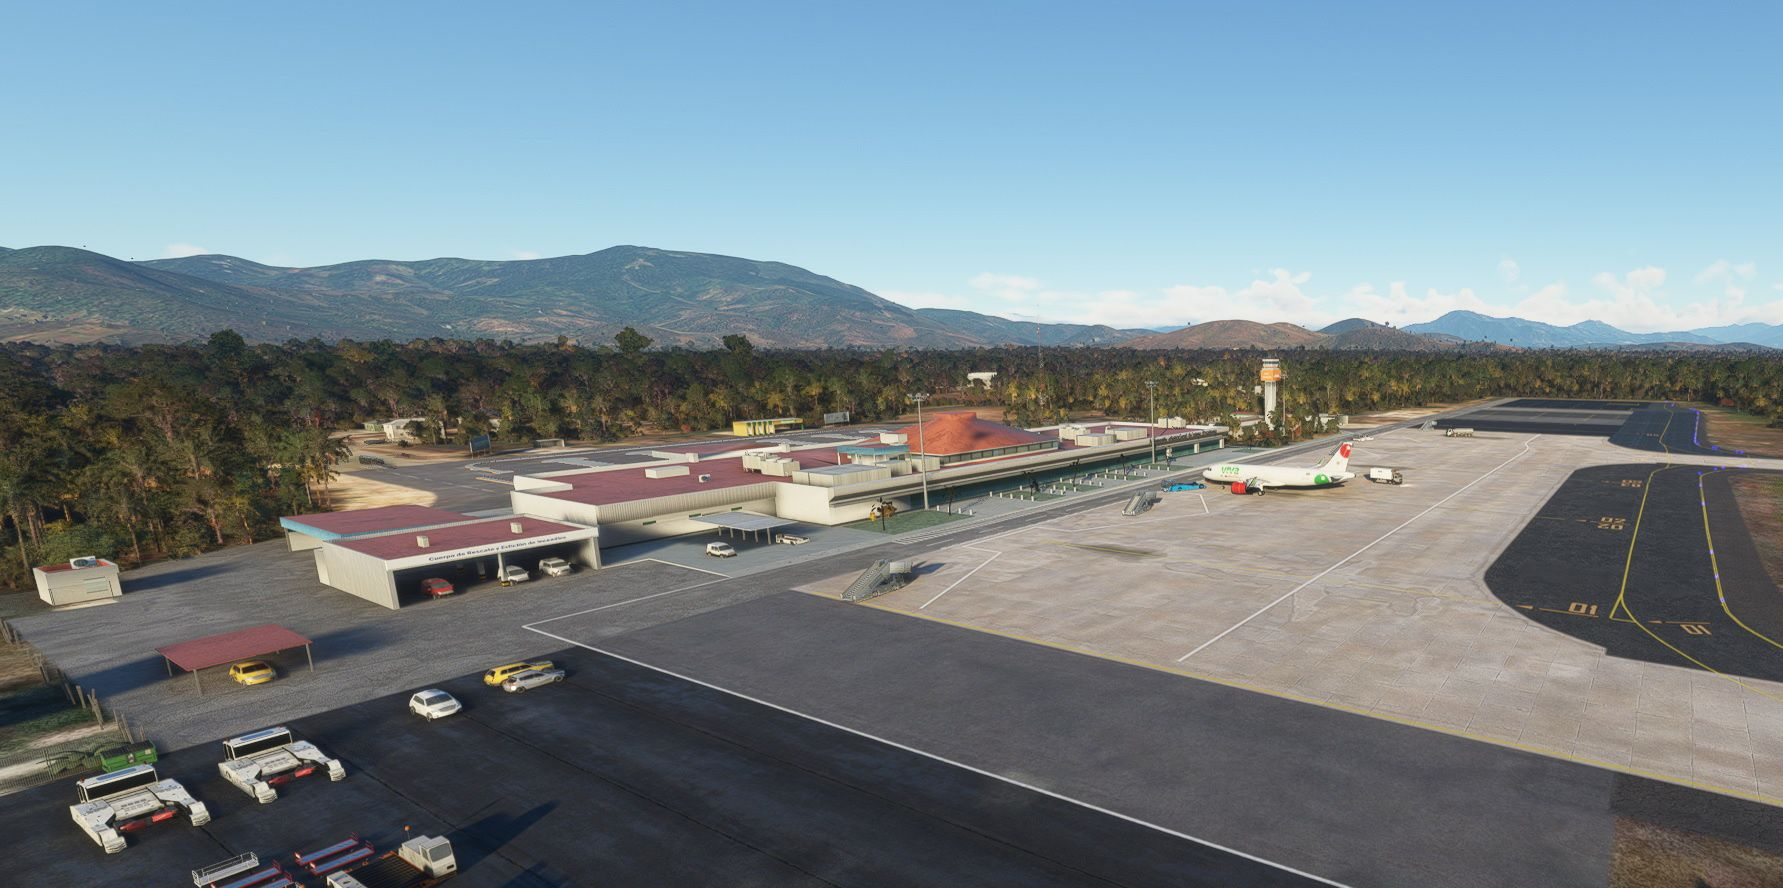 MSFS MMZH Ixtapa-Zihuatanejo International Airport